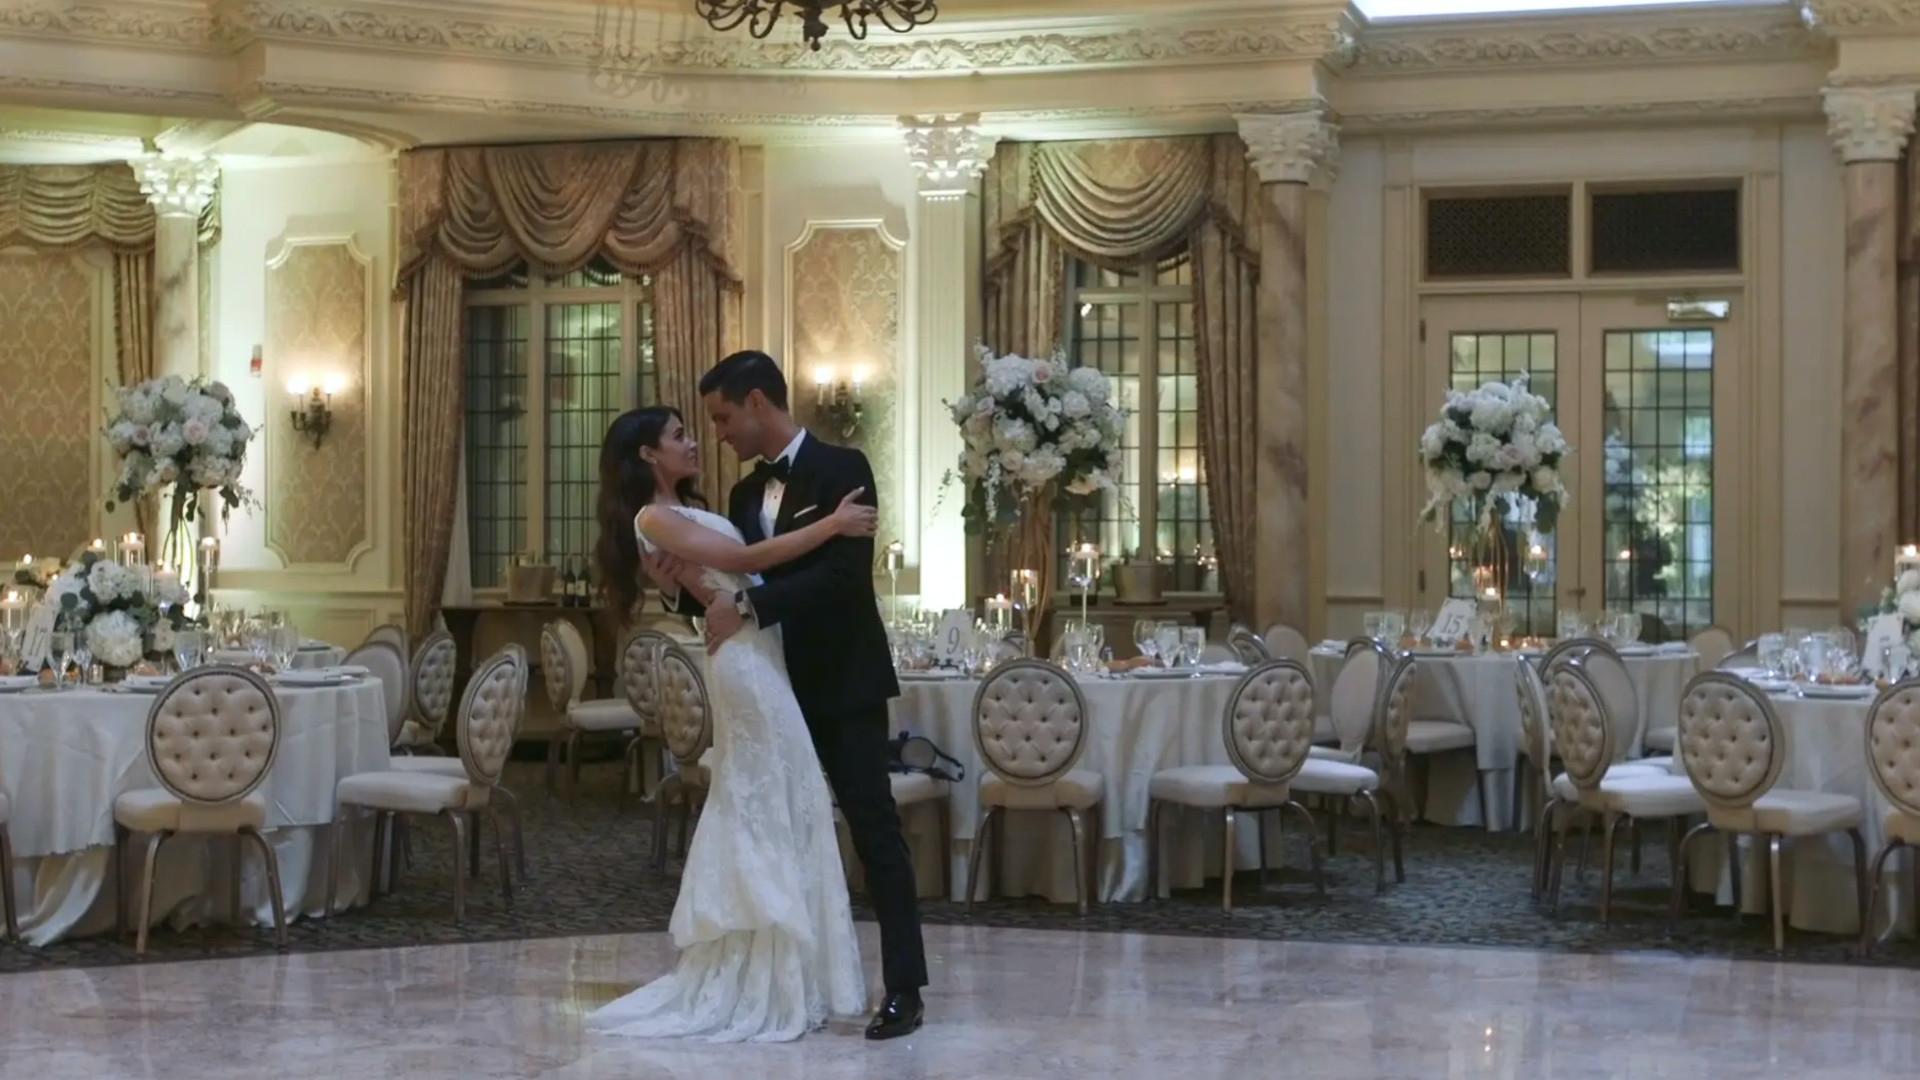 Client - 5th Avenue Digital | Wedding Sample | Pleasantdale Chateau